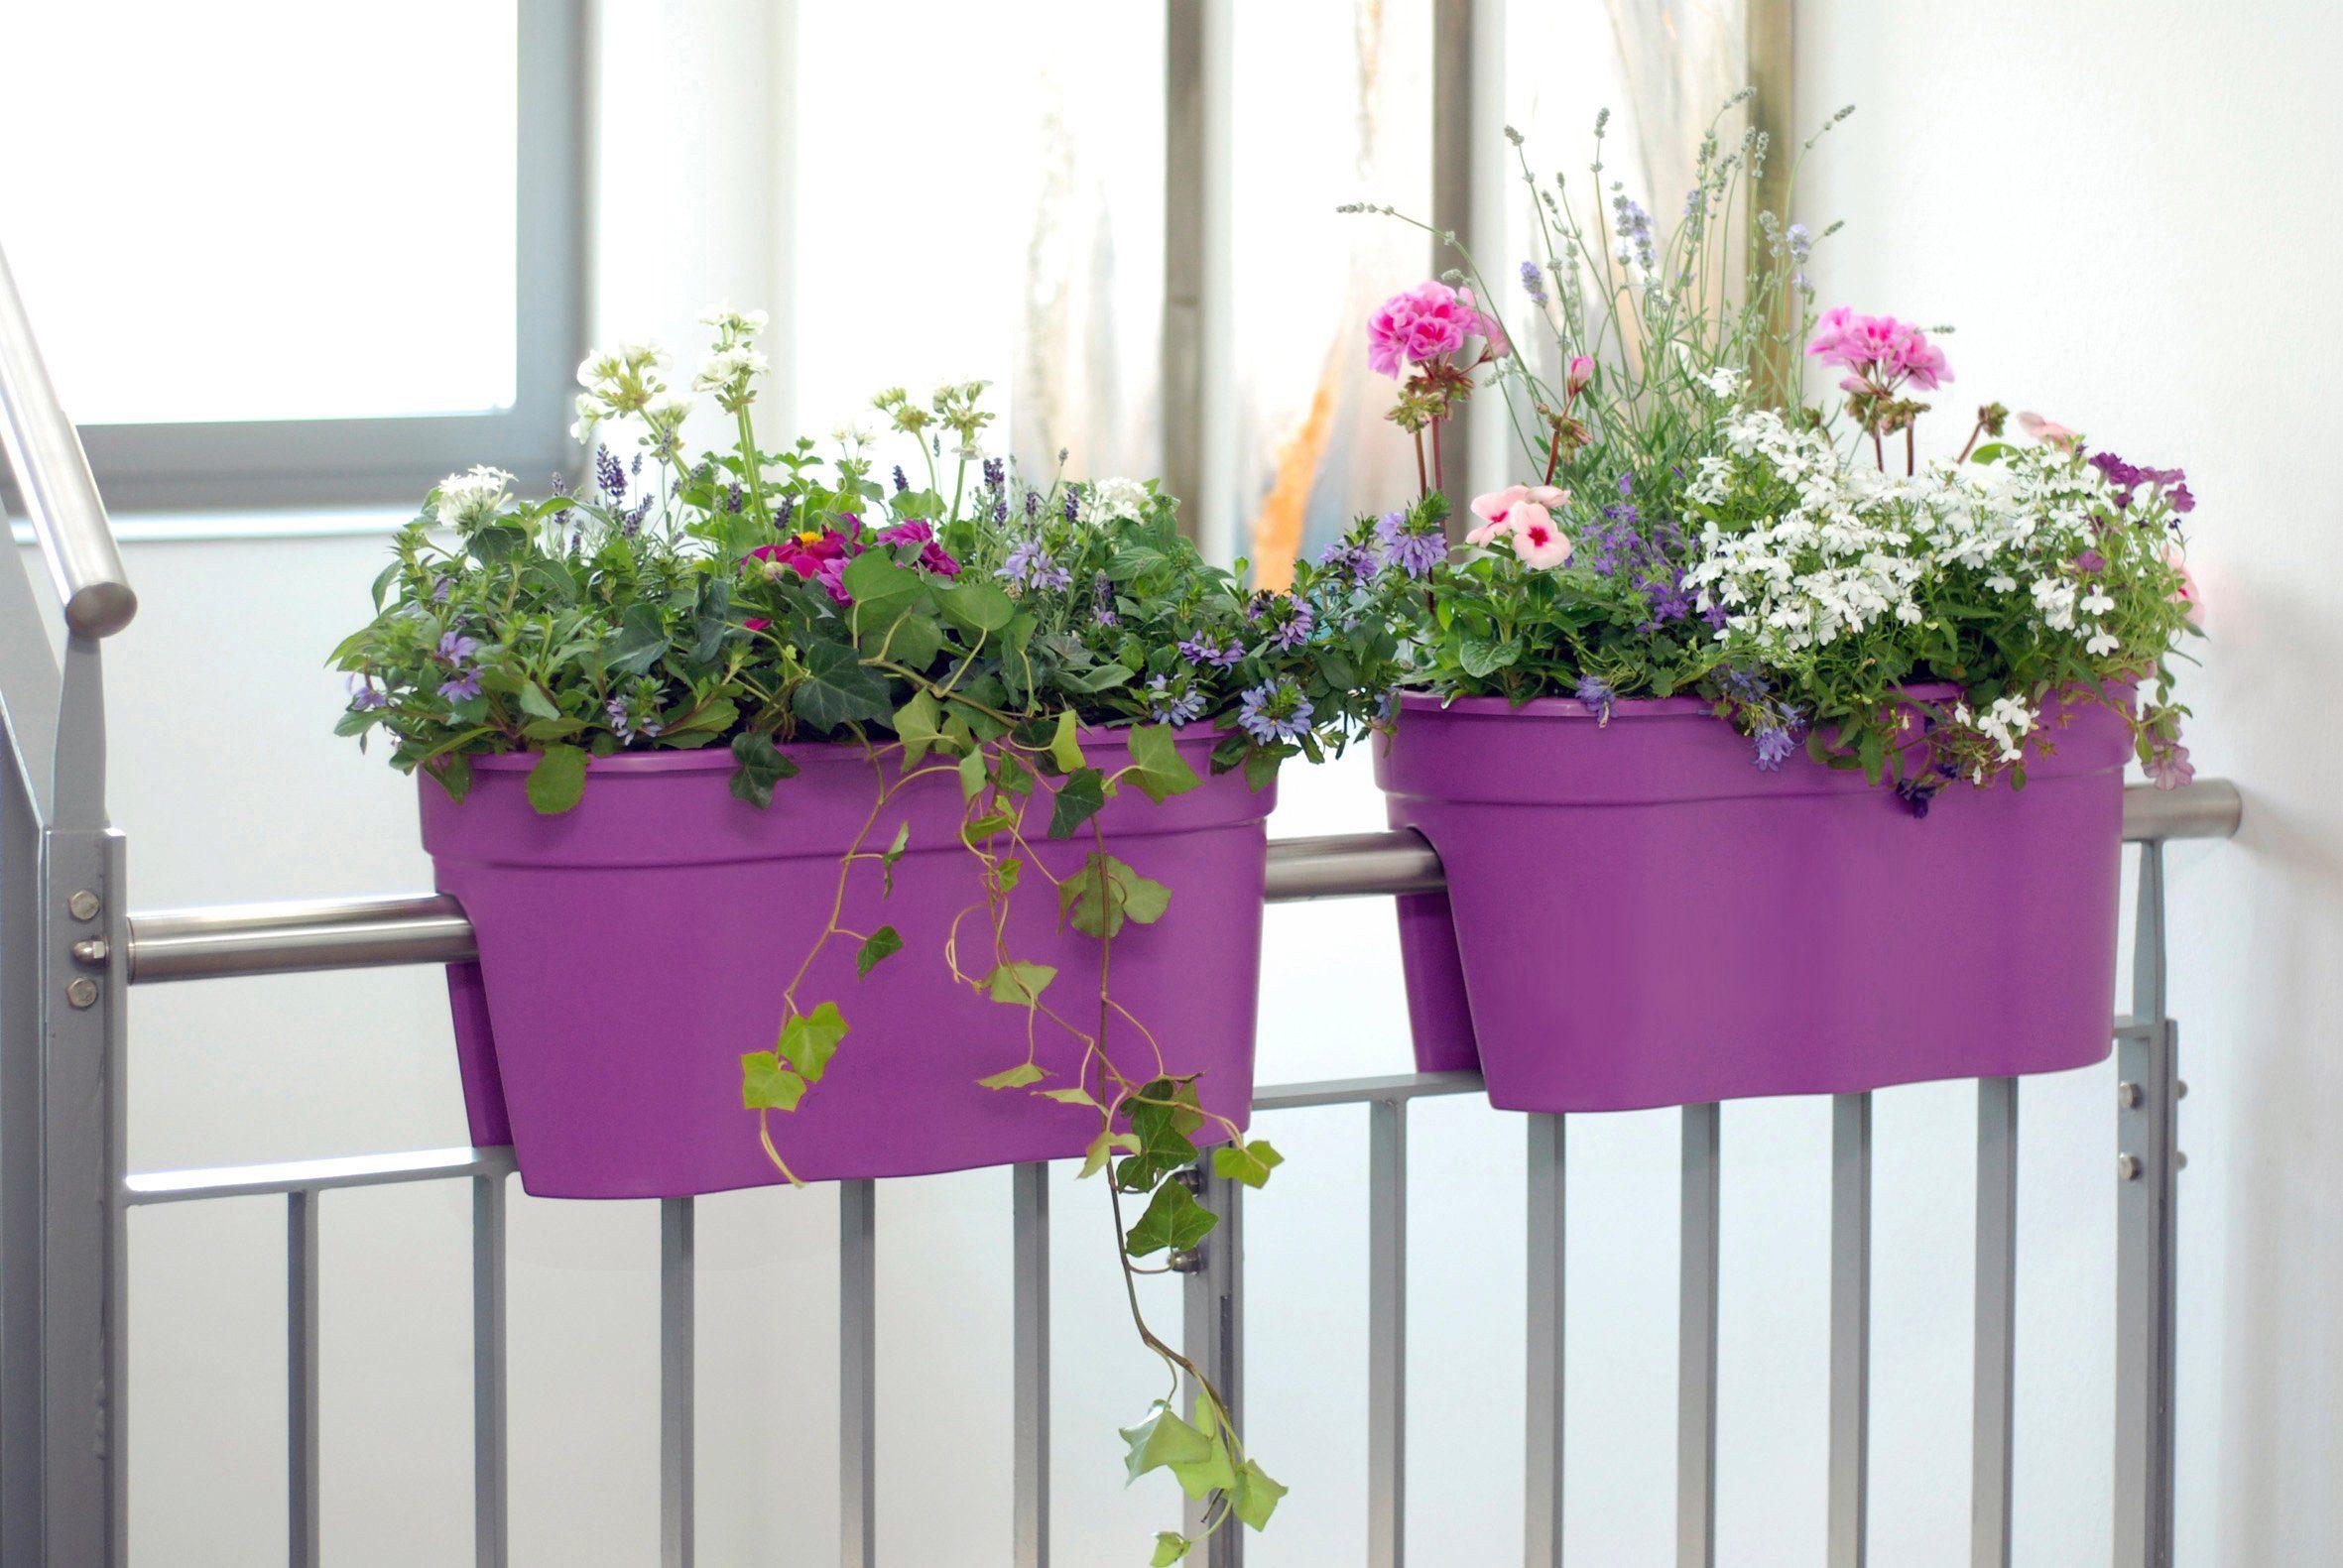 Set: Pflanztopf »Flowerclip XL«, 2 Stk., lila